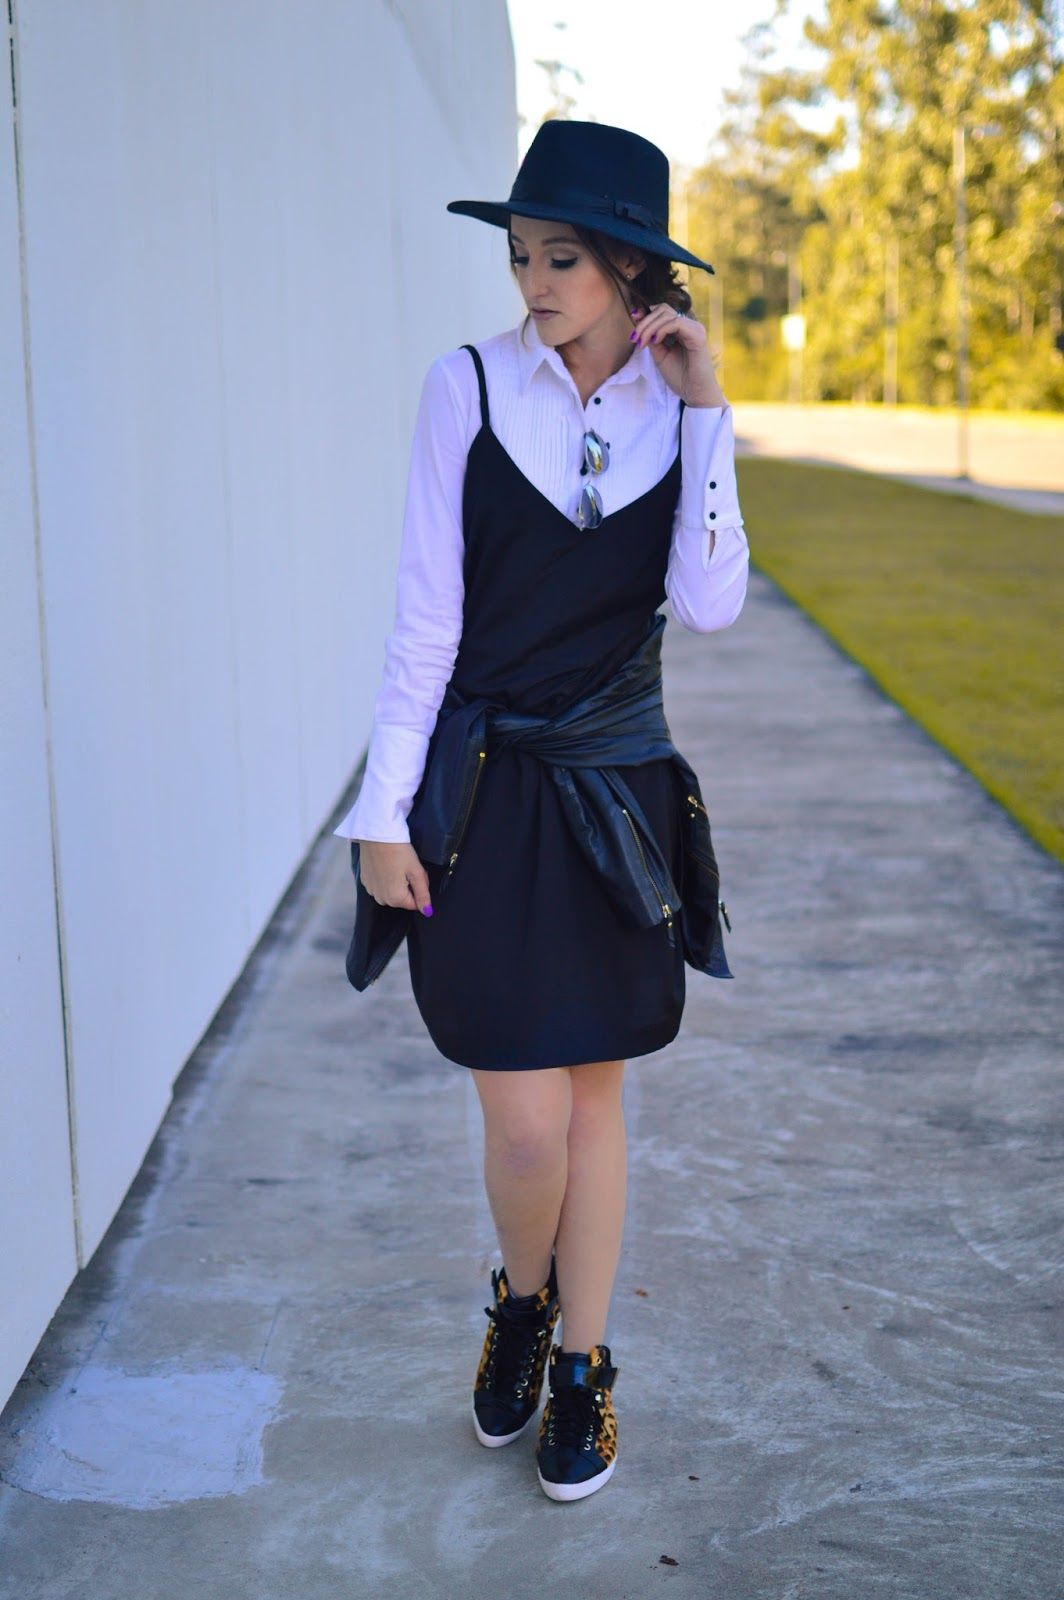 slipdress com camisa. look, fashion, blog, hat,